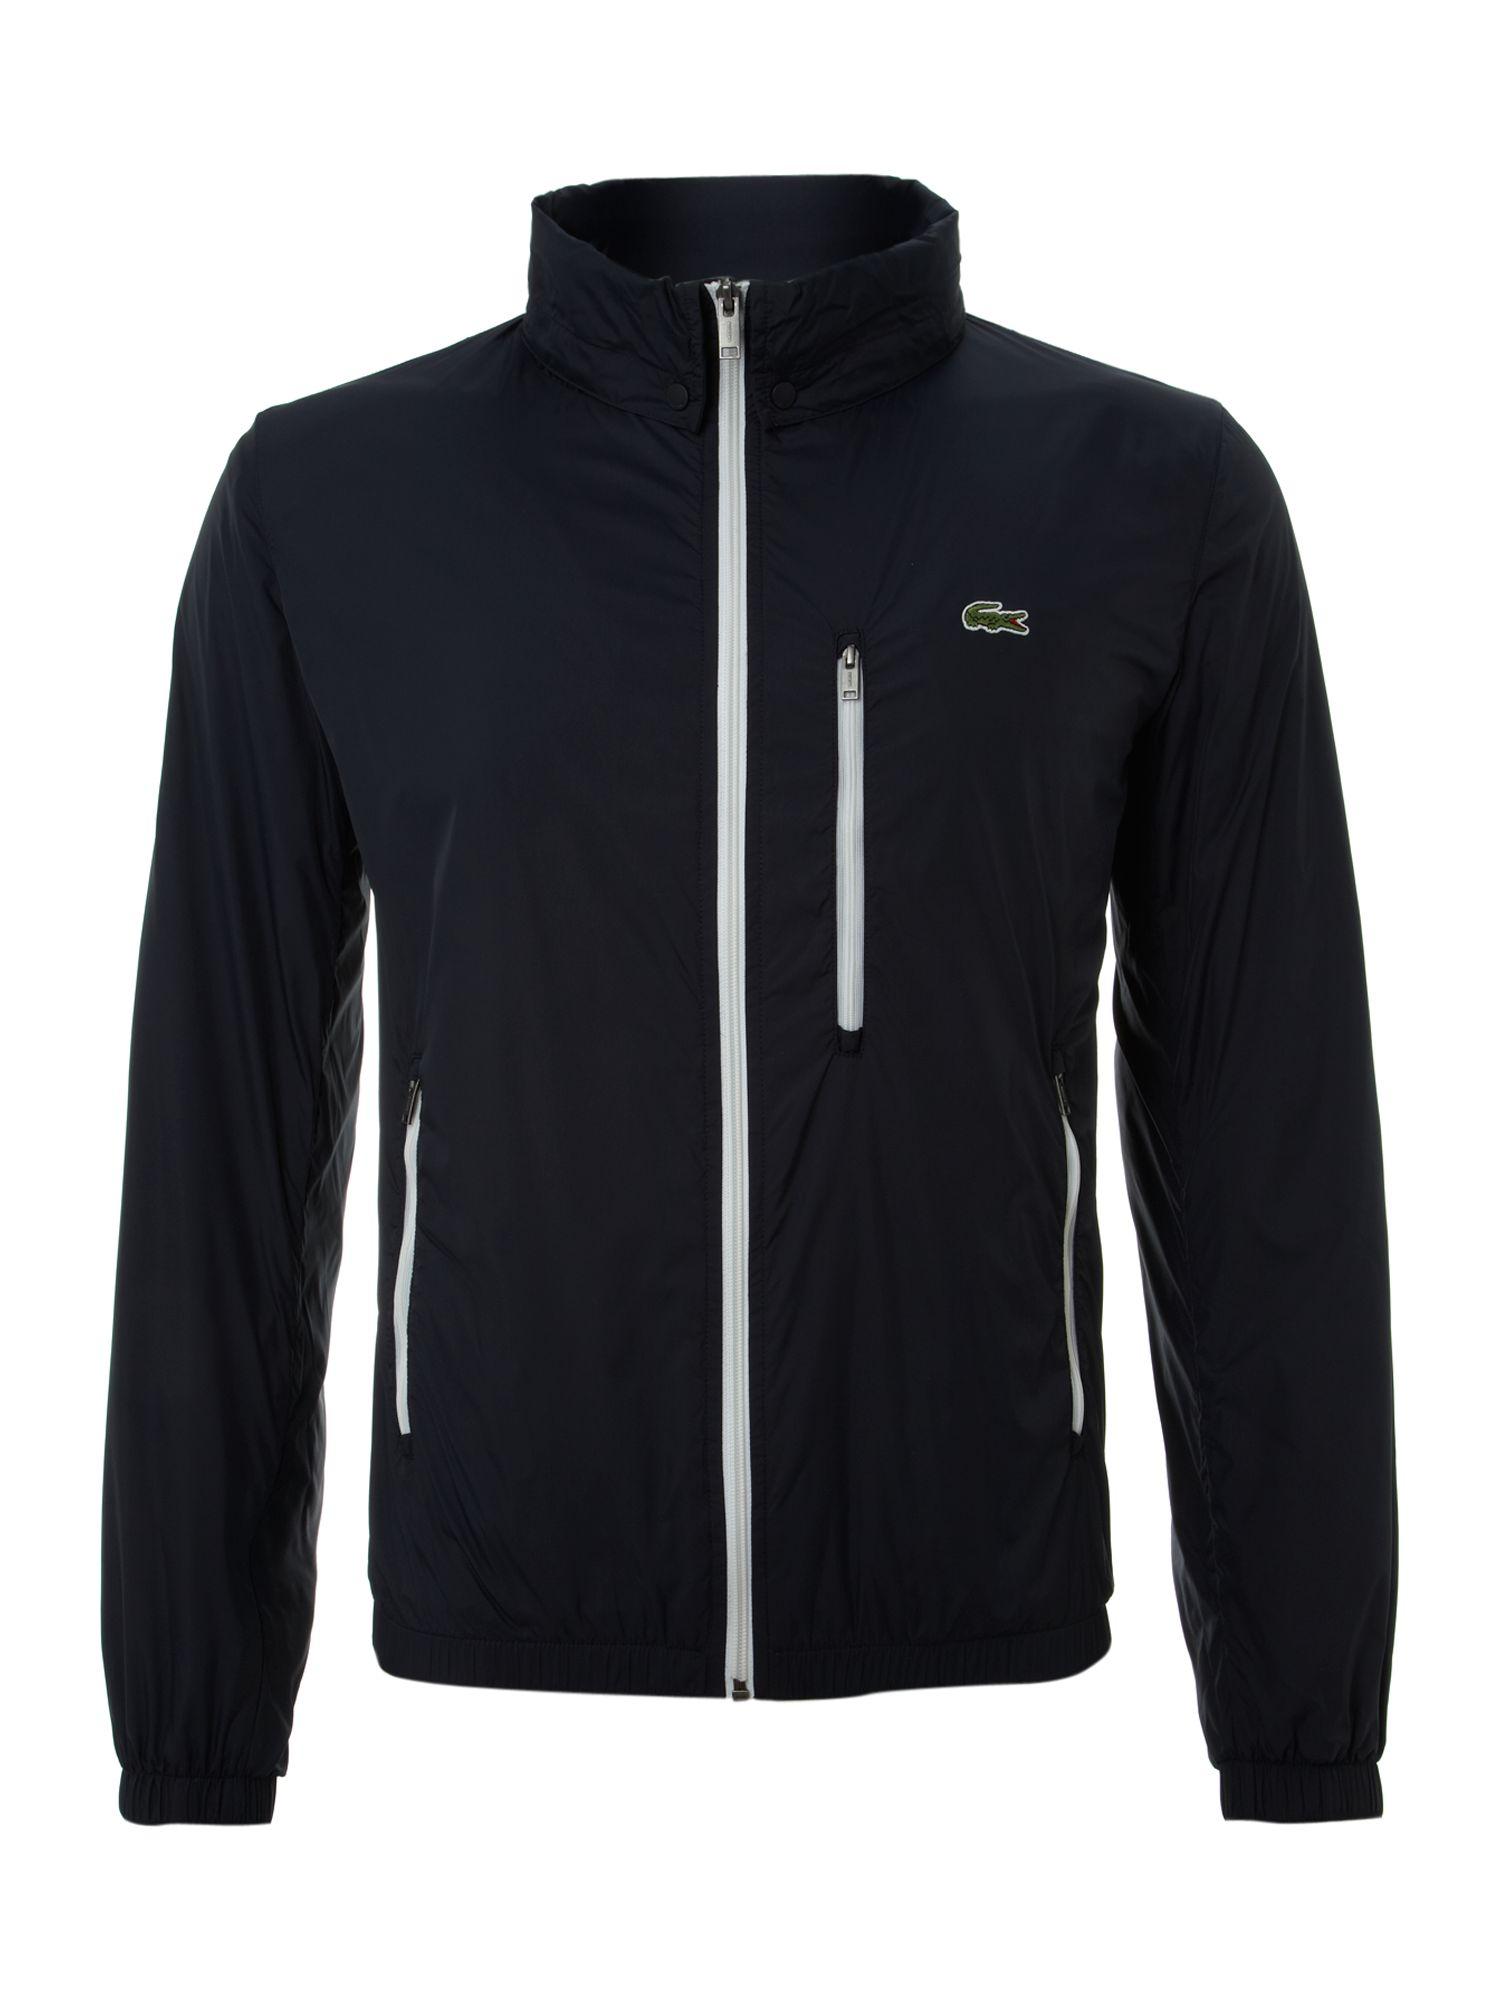 Lacoste Zip Through Hooded Jacket In Black For Men Lyst